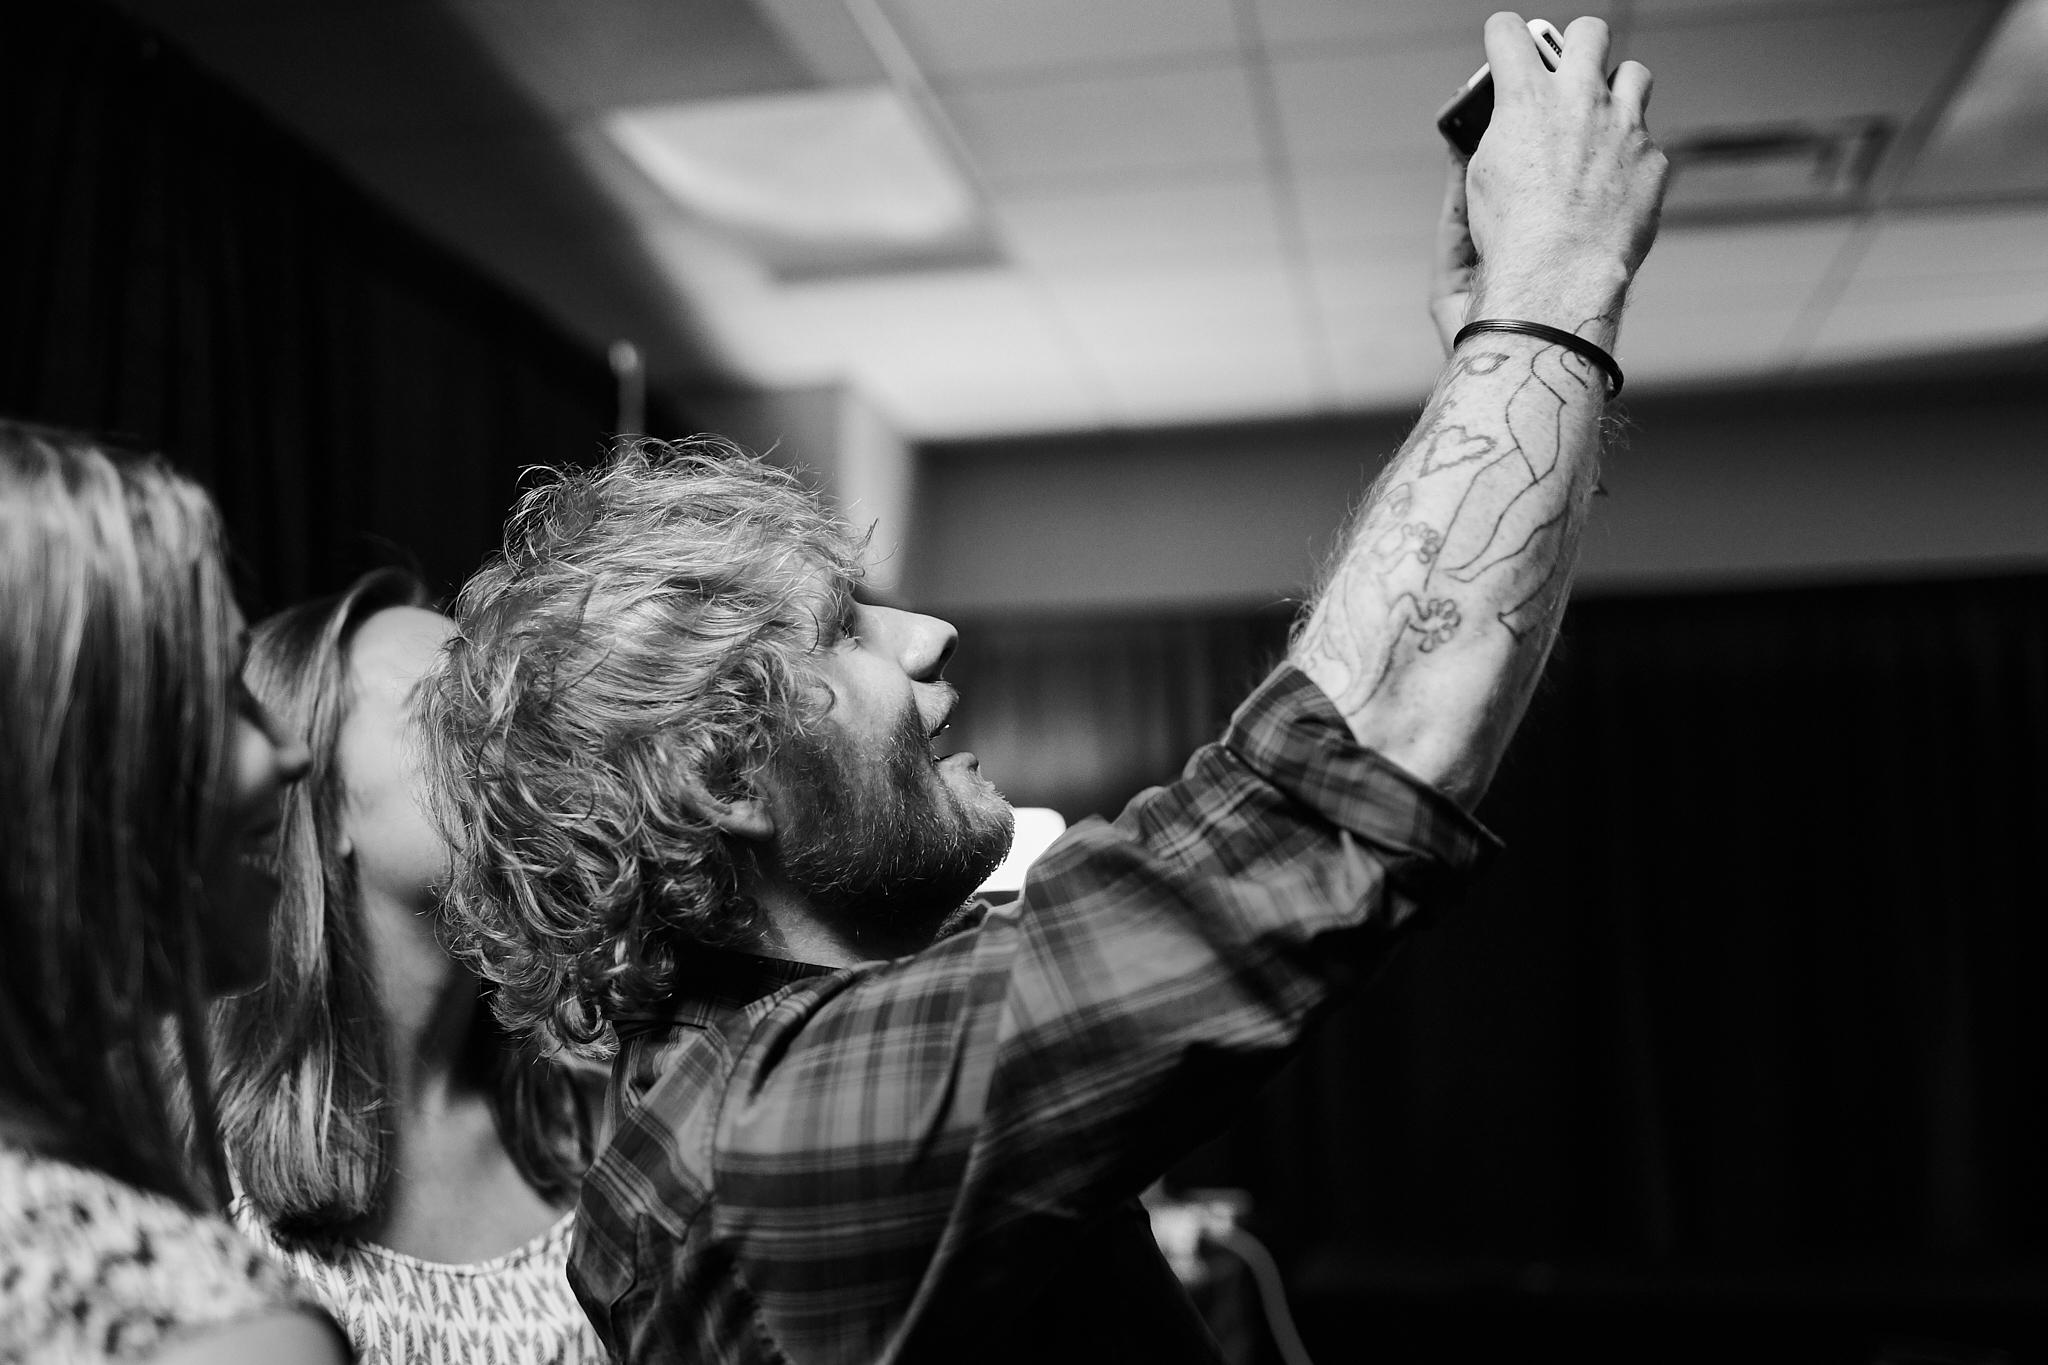 Ed_Sheeran_Gift_Presentation_09-15-2015_Photo_By_Joe_Lemke_008.jpg